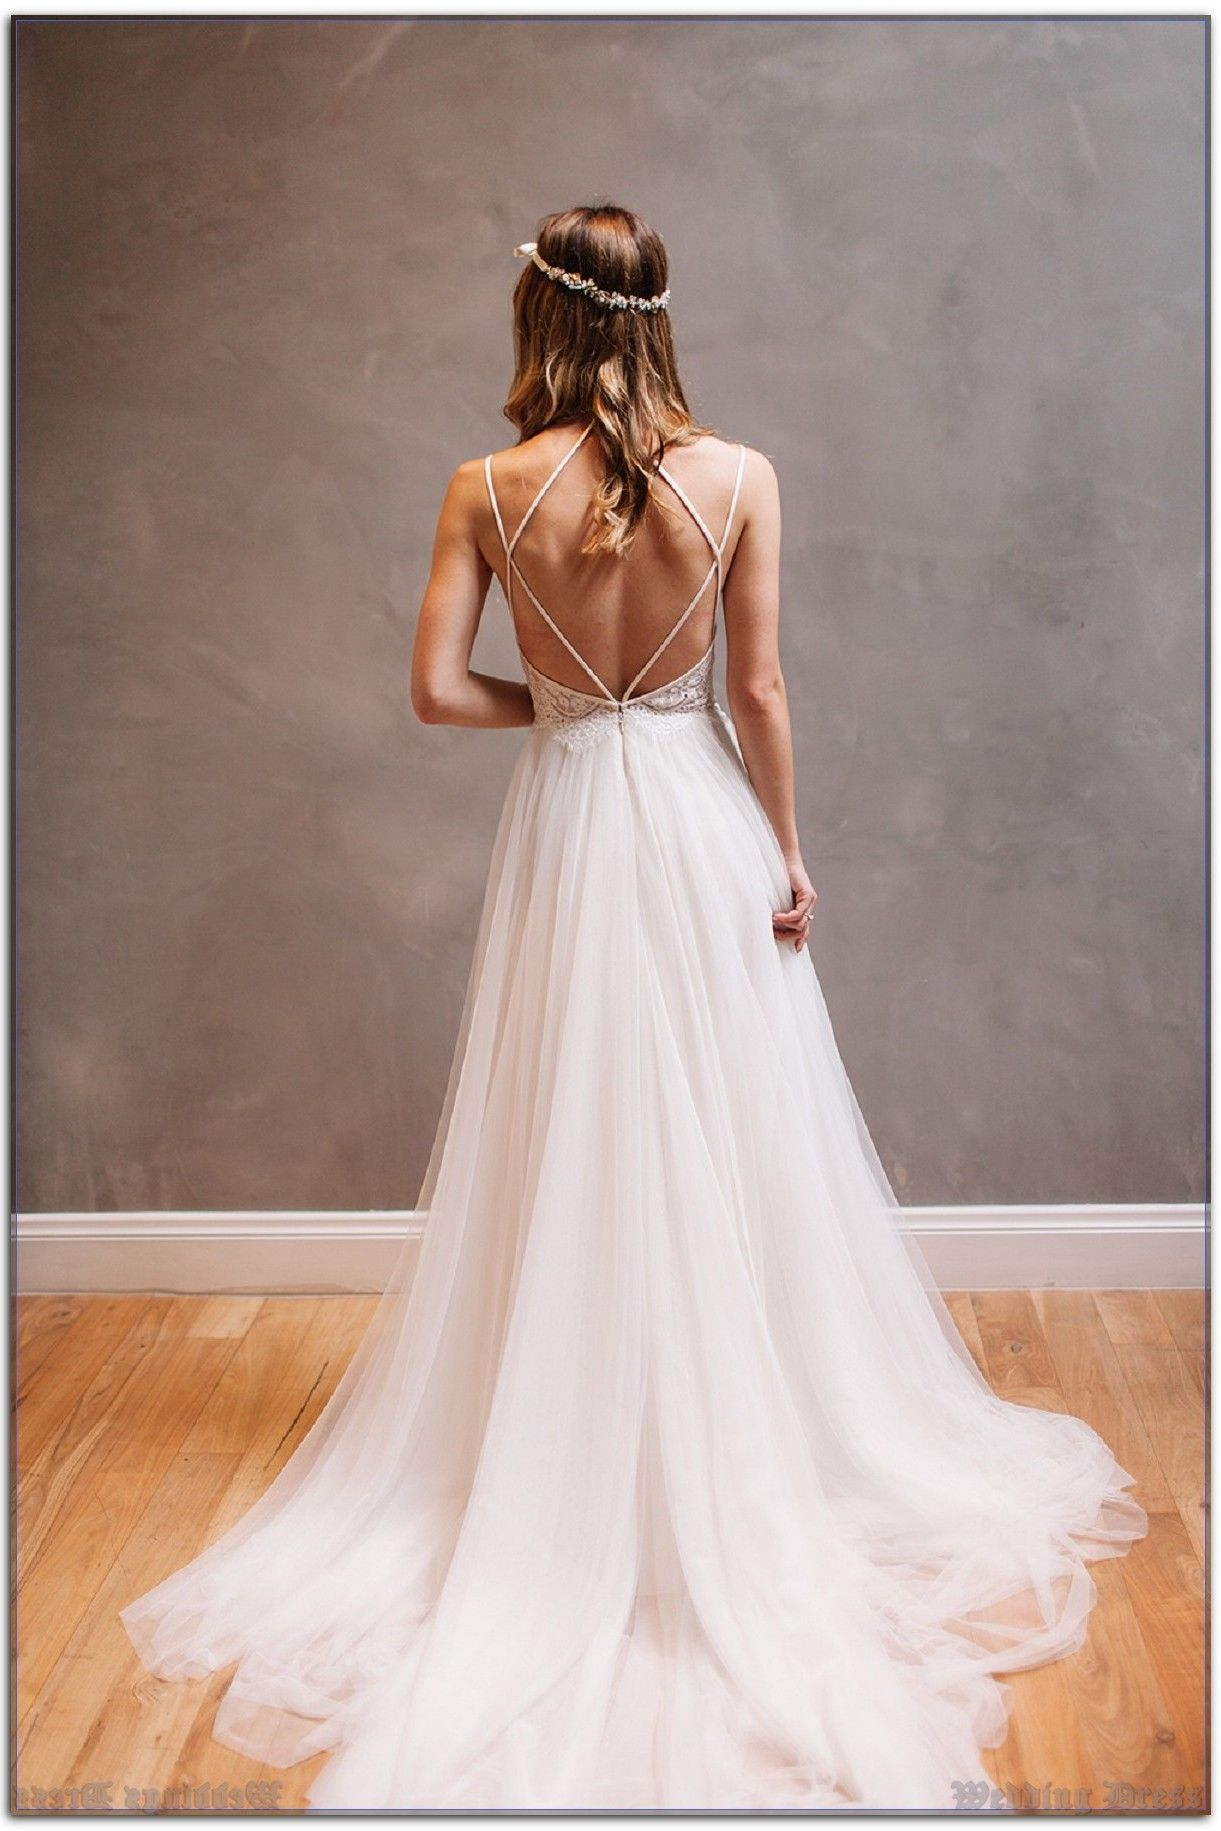 OMG! The Best Weddings Dress Ever!